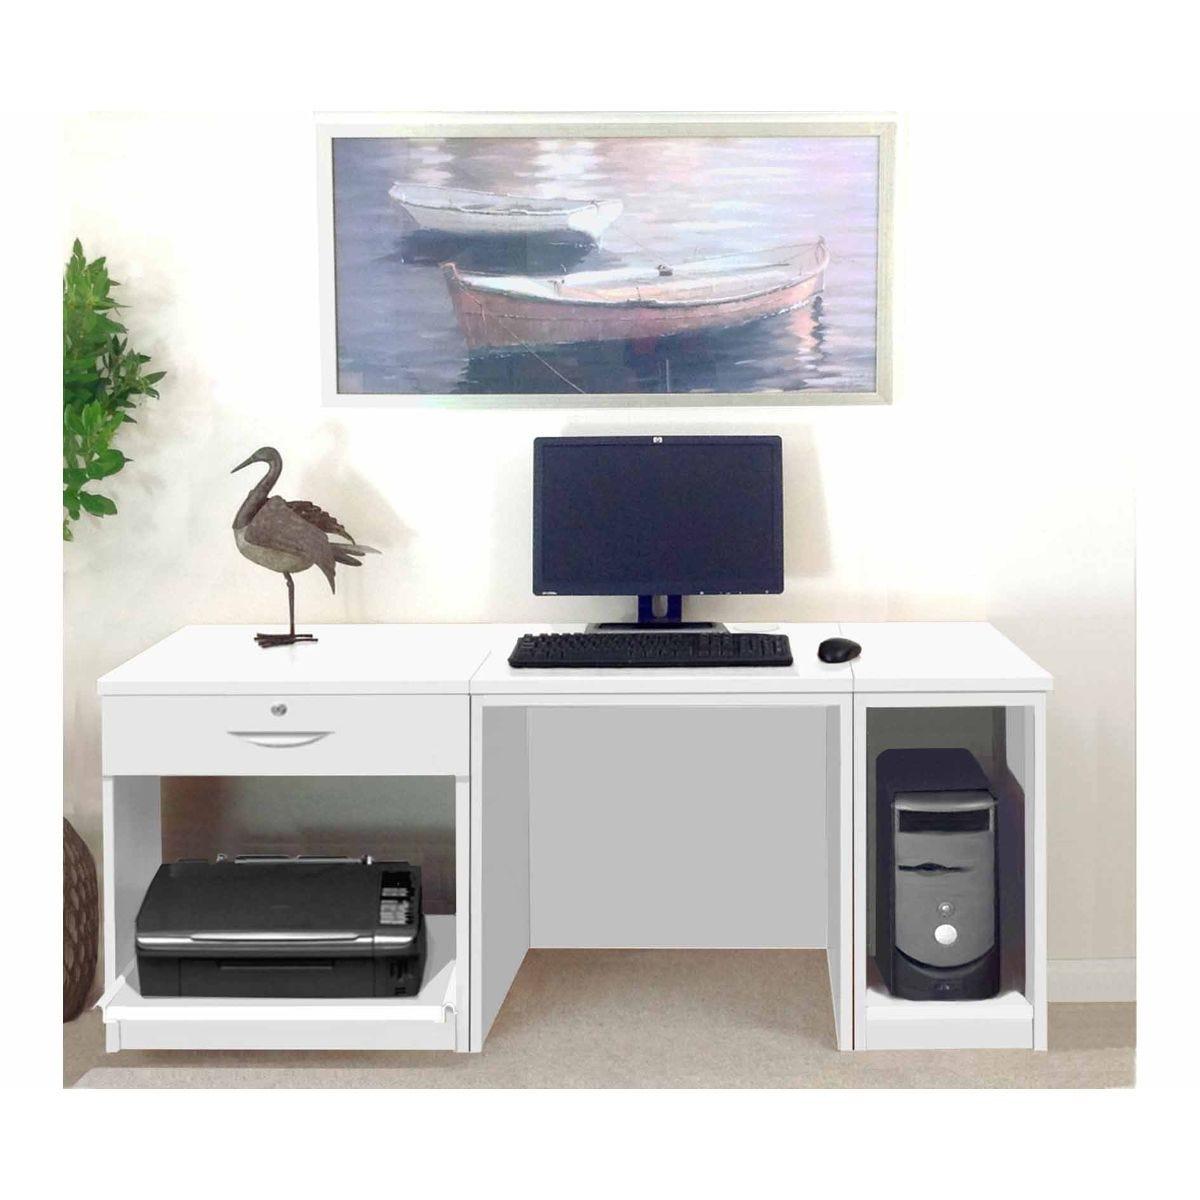 R White Home Office Furniture Desk, White Satin